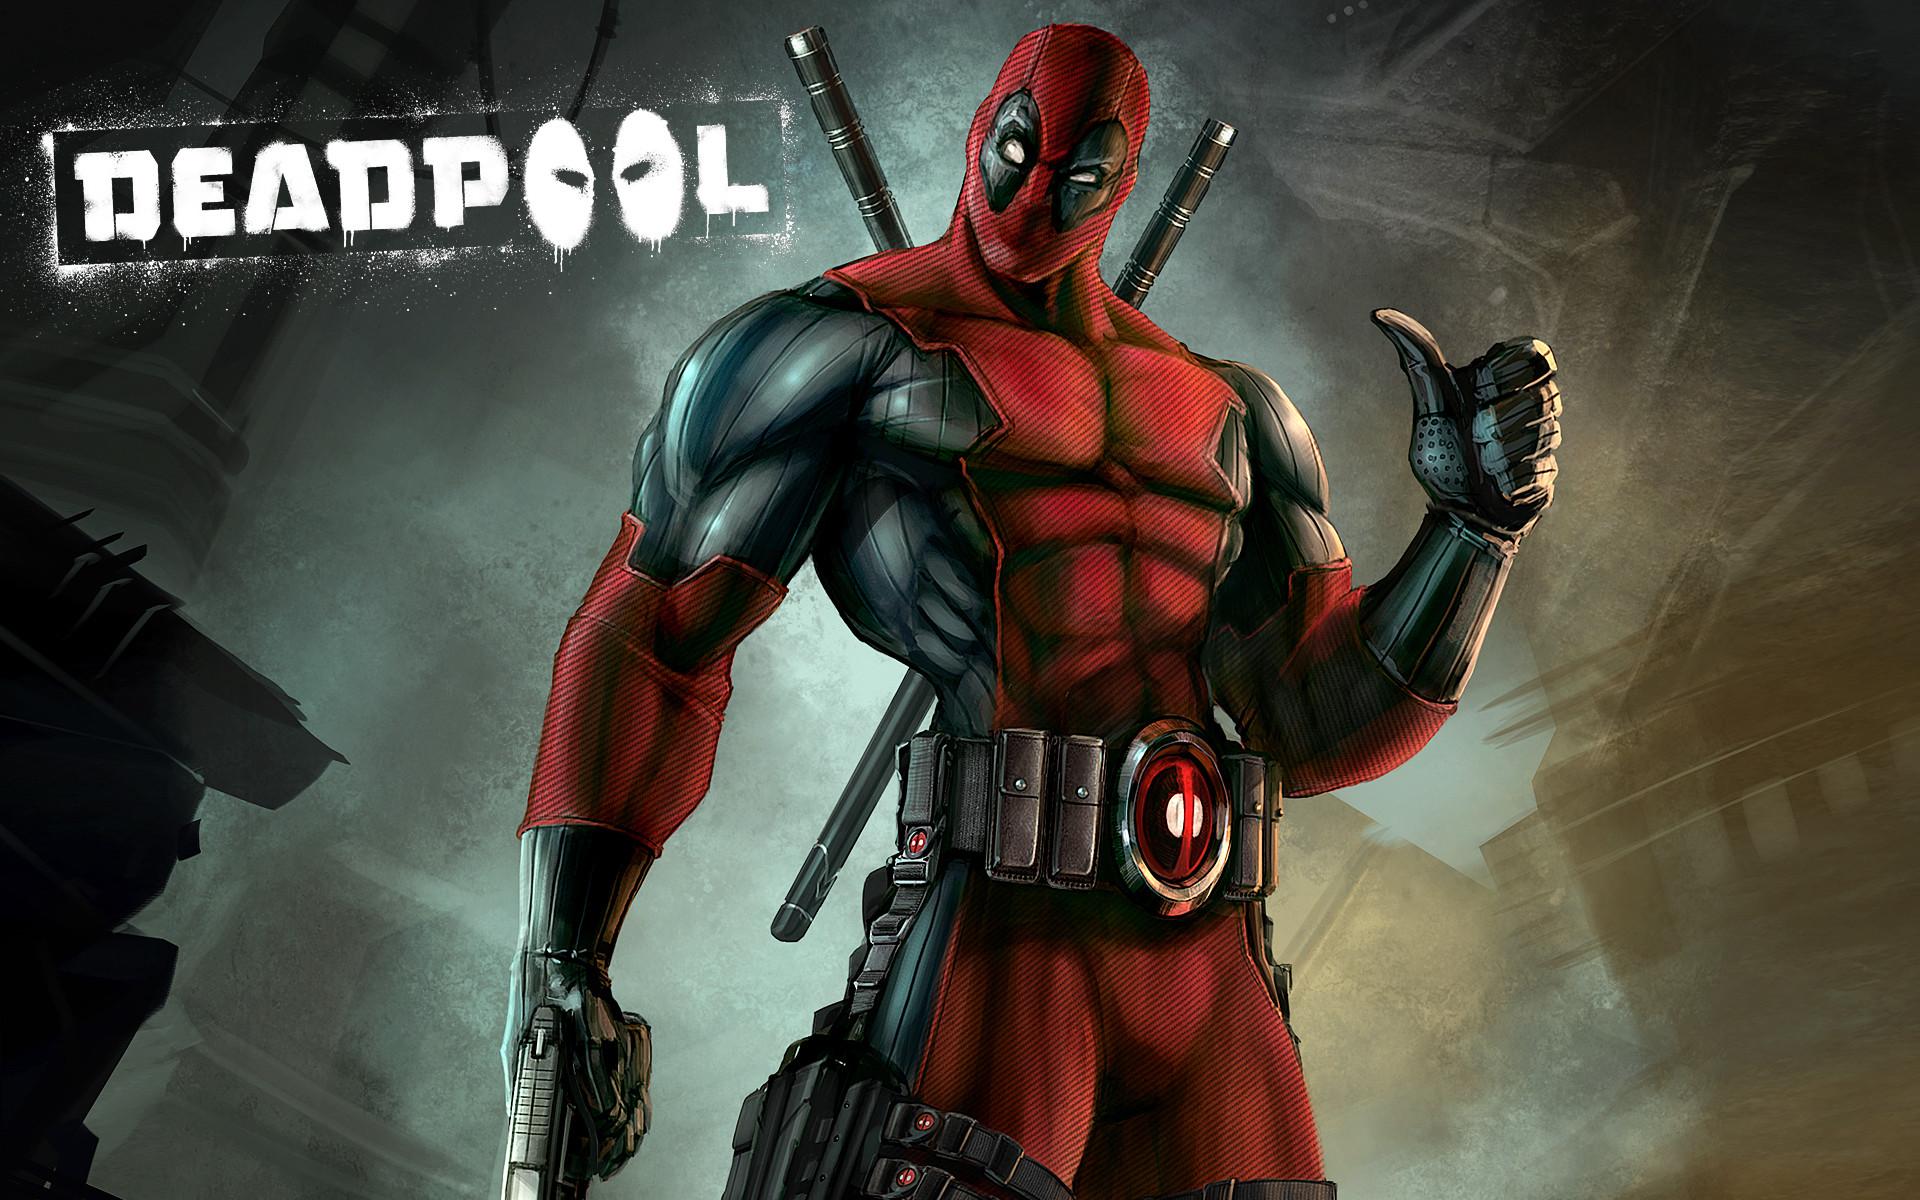 Heroes comics Deadpool superhero Games wallpaper background